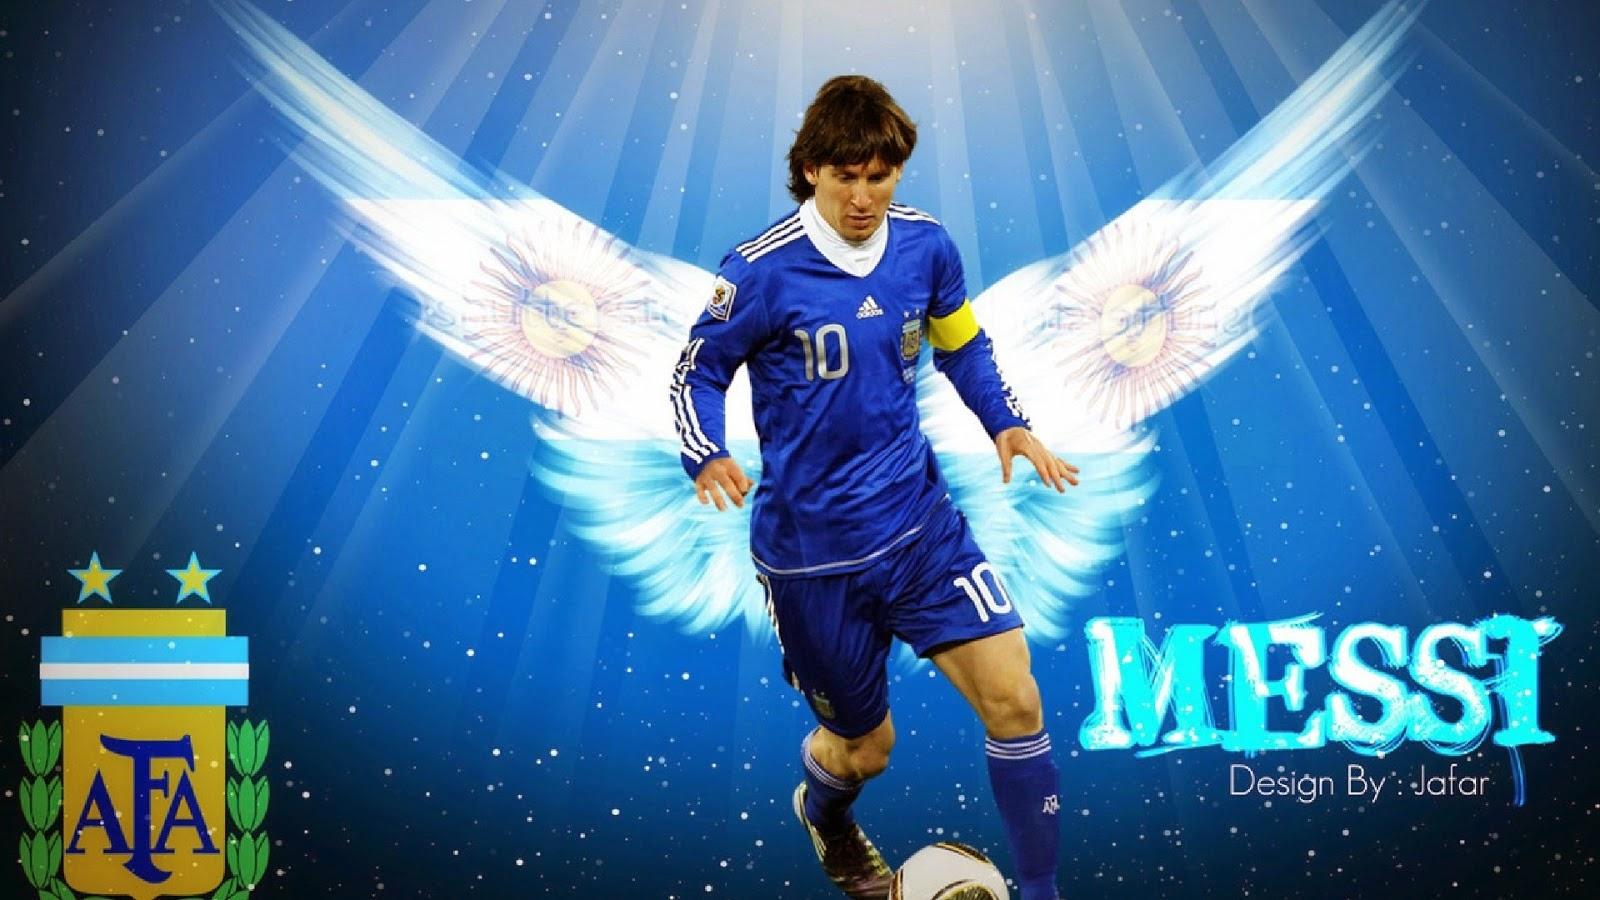 Leo Messi Wallpaper - Fifa World Cup Wallpaper Messi , HD Wallpaper & Backgrounds